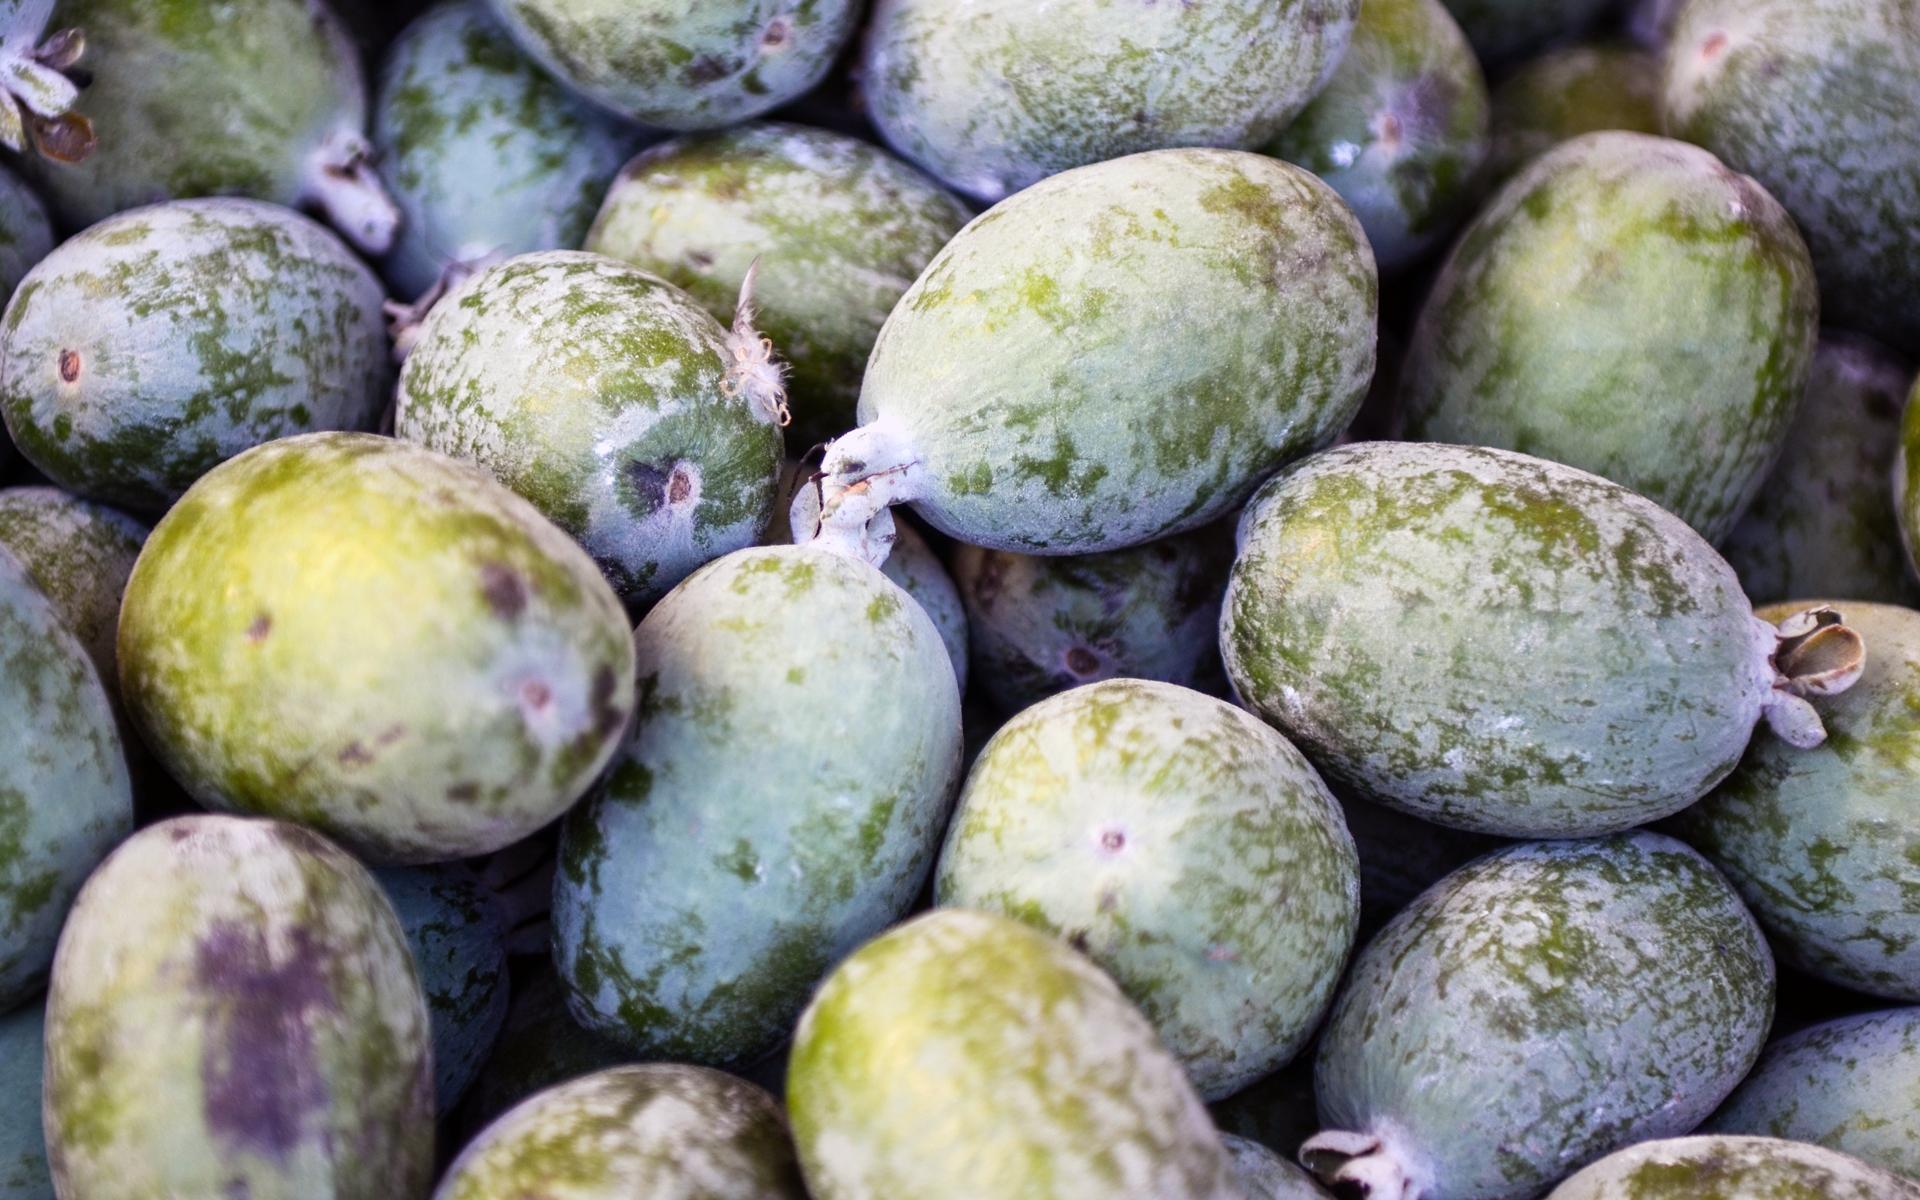 Fruits du goyavier de Montevideo. Crédits : Franco Folini - Flickr